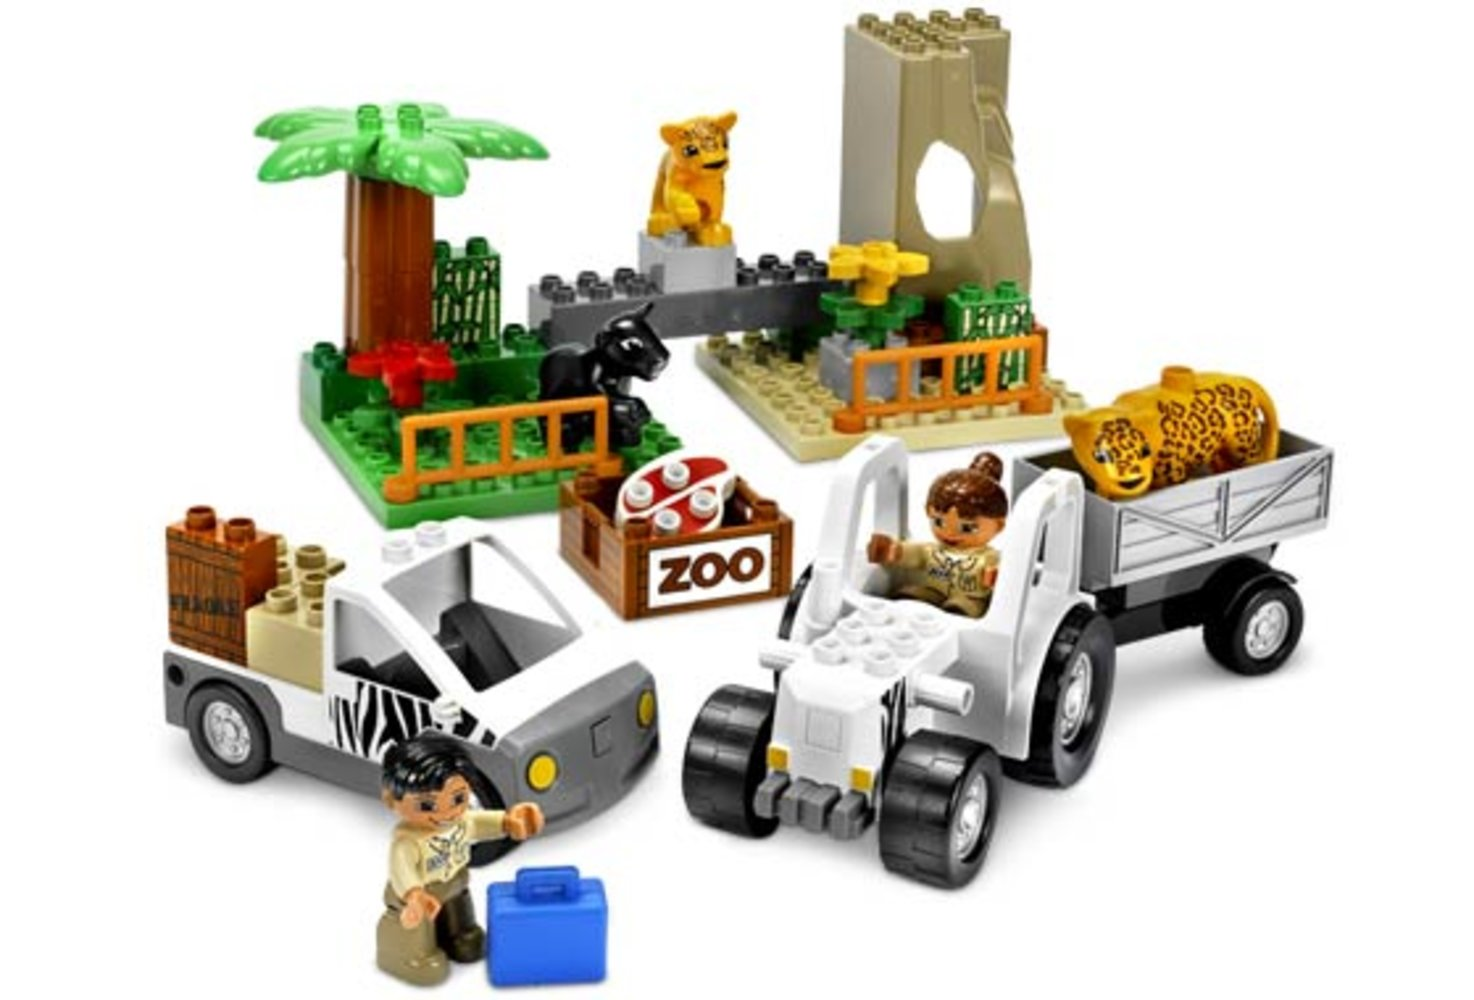 Zoo Vehicles